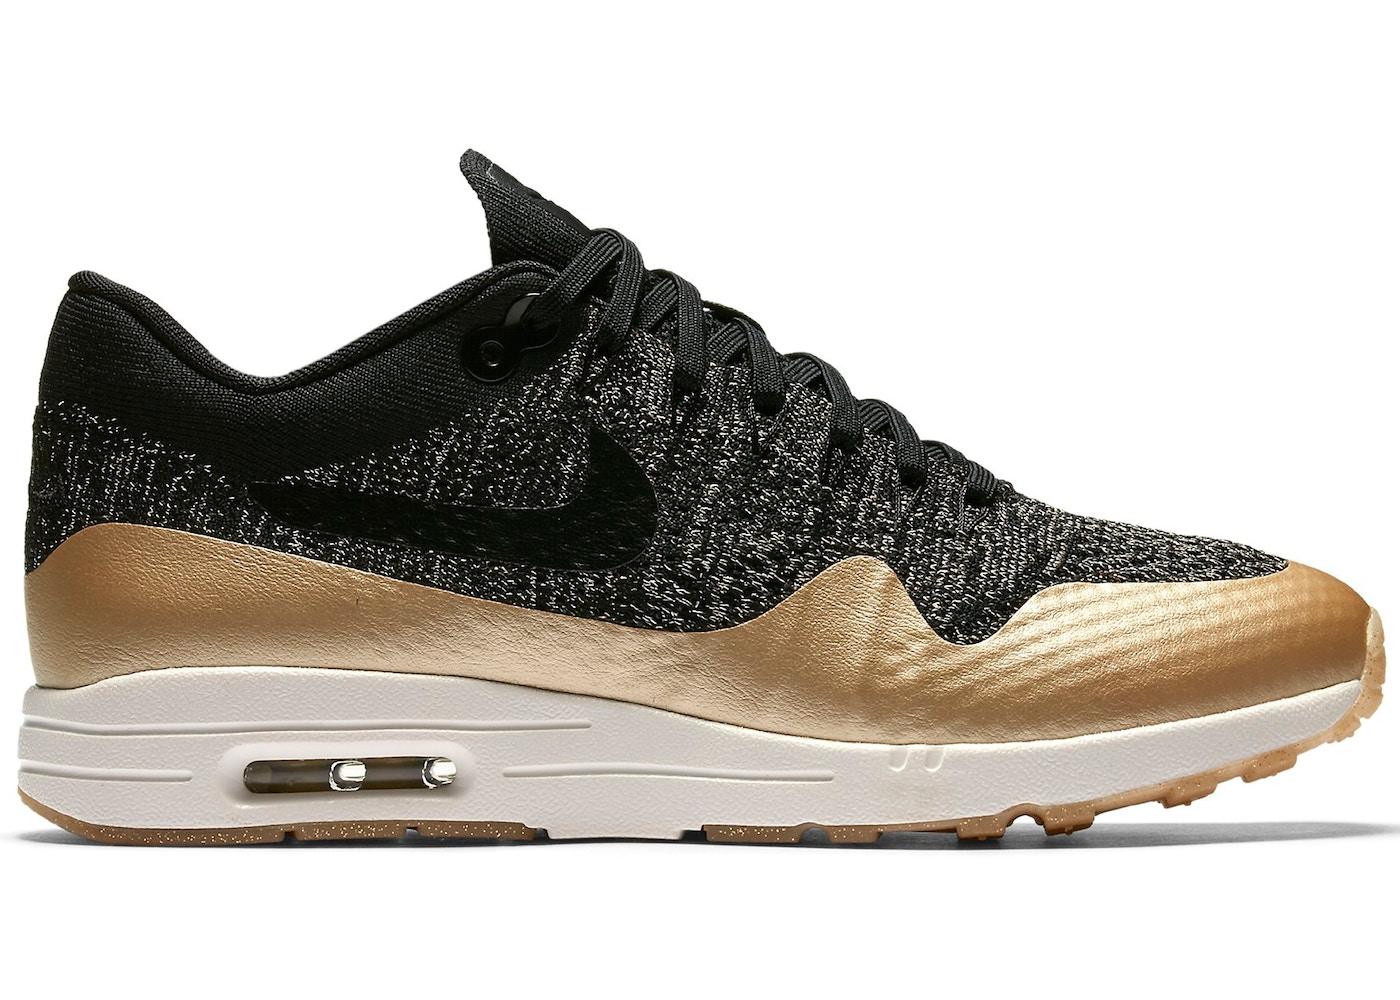 Nike Air Max 1 Ultra Flyknit Metallic Gold (W) - 881195-001